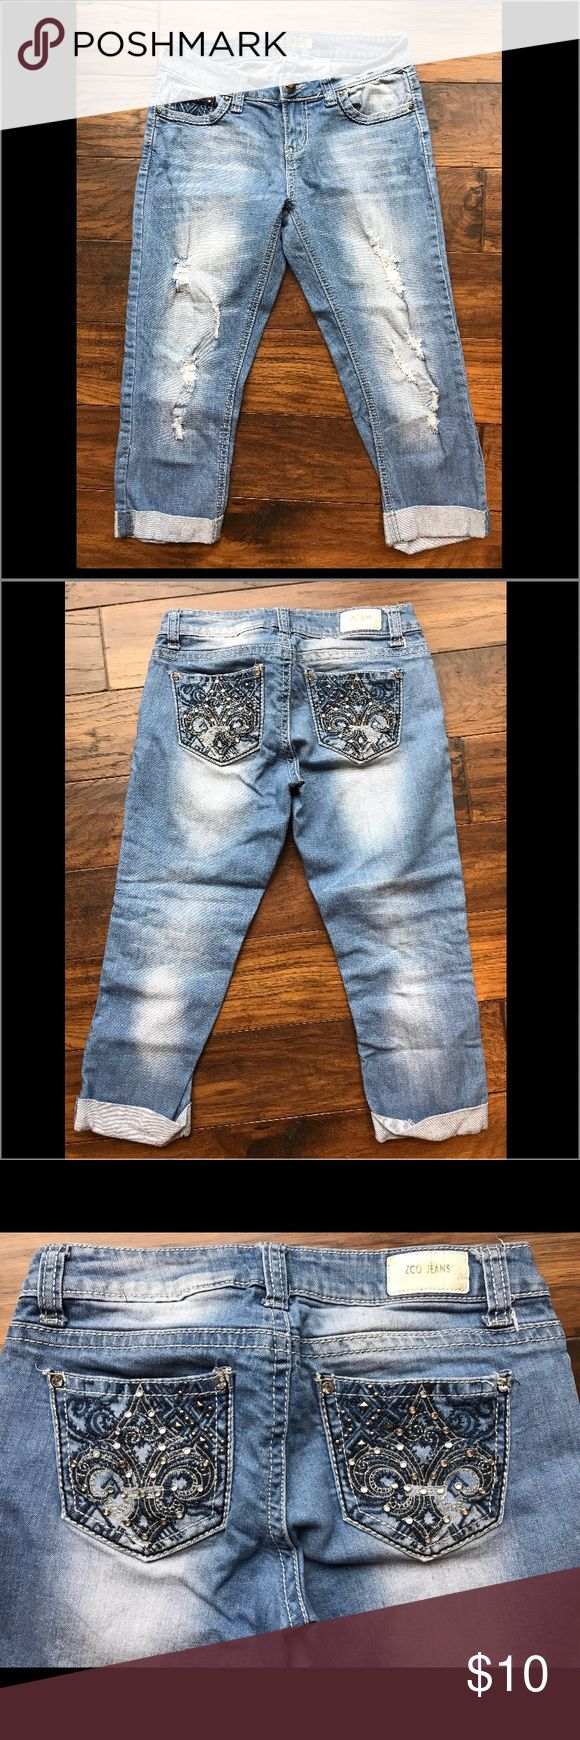 ZCO JEANS Size 9 Juniors' Capri Pants ZCO JEANS Size 9 Studded/Torn Look Jean Capri's. Cuffed Hem. Good Condition. ZCO JEANS Jeans Ankle & Cropped